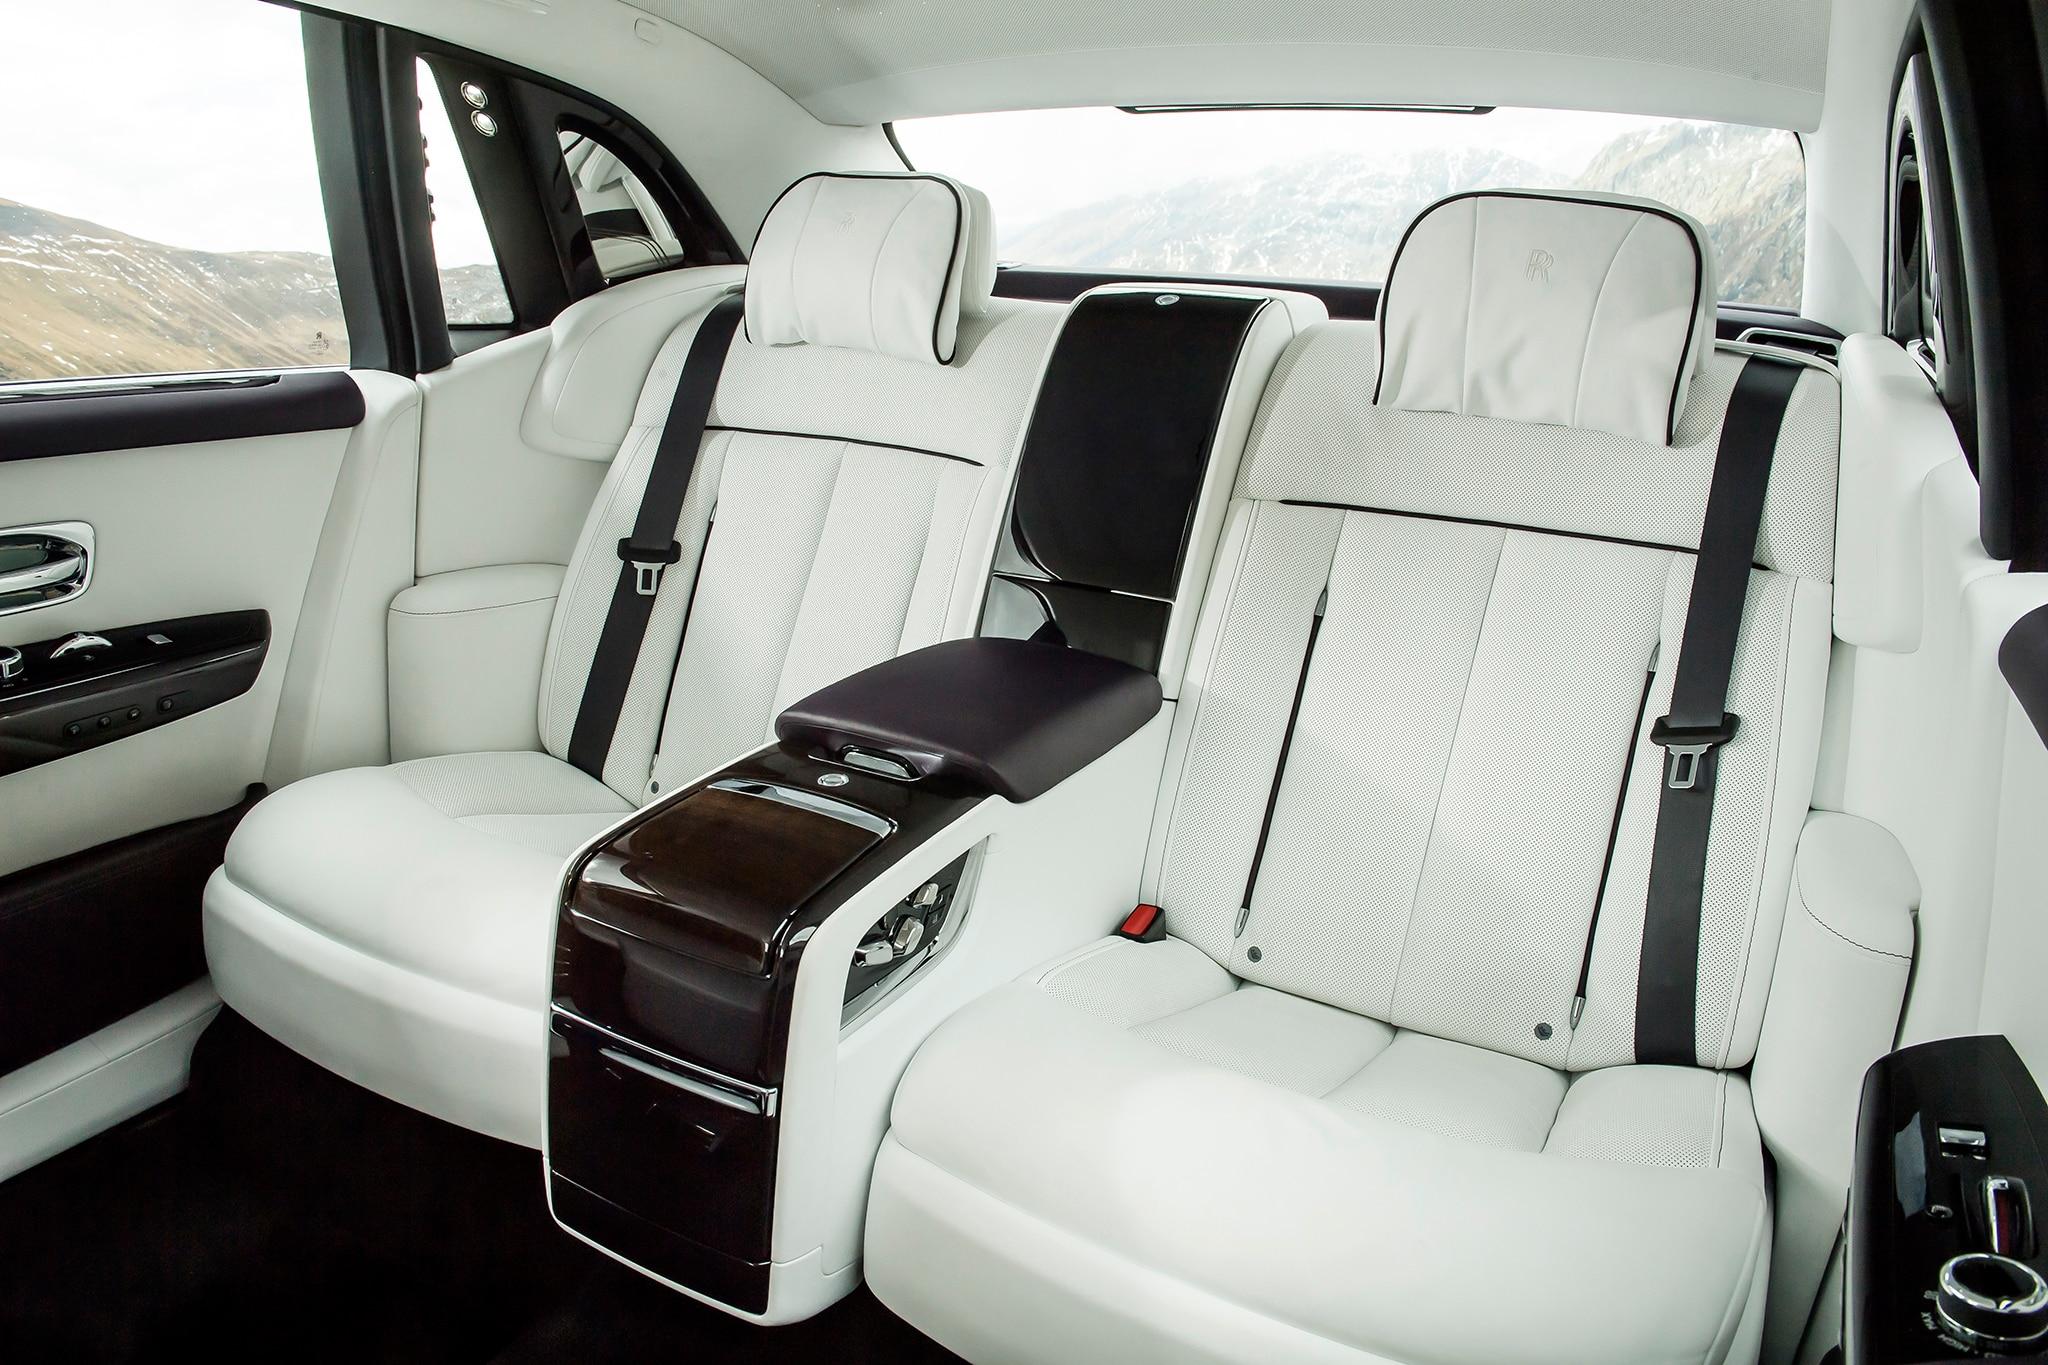 2018 Rolls Royce Phantom First Drive Review